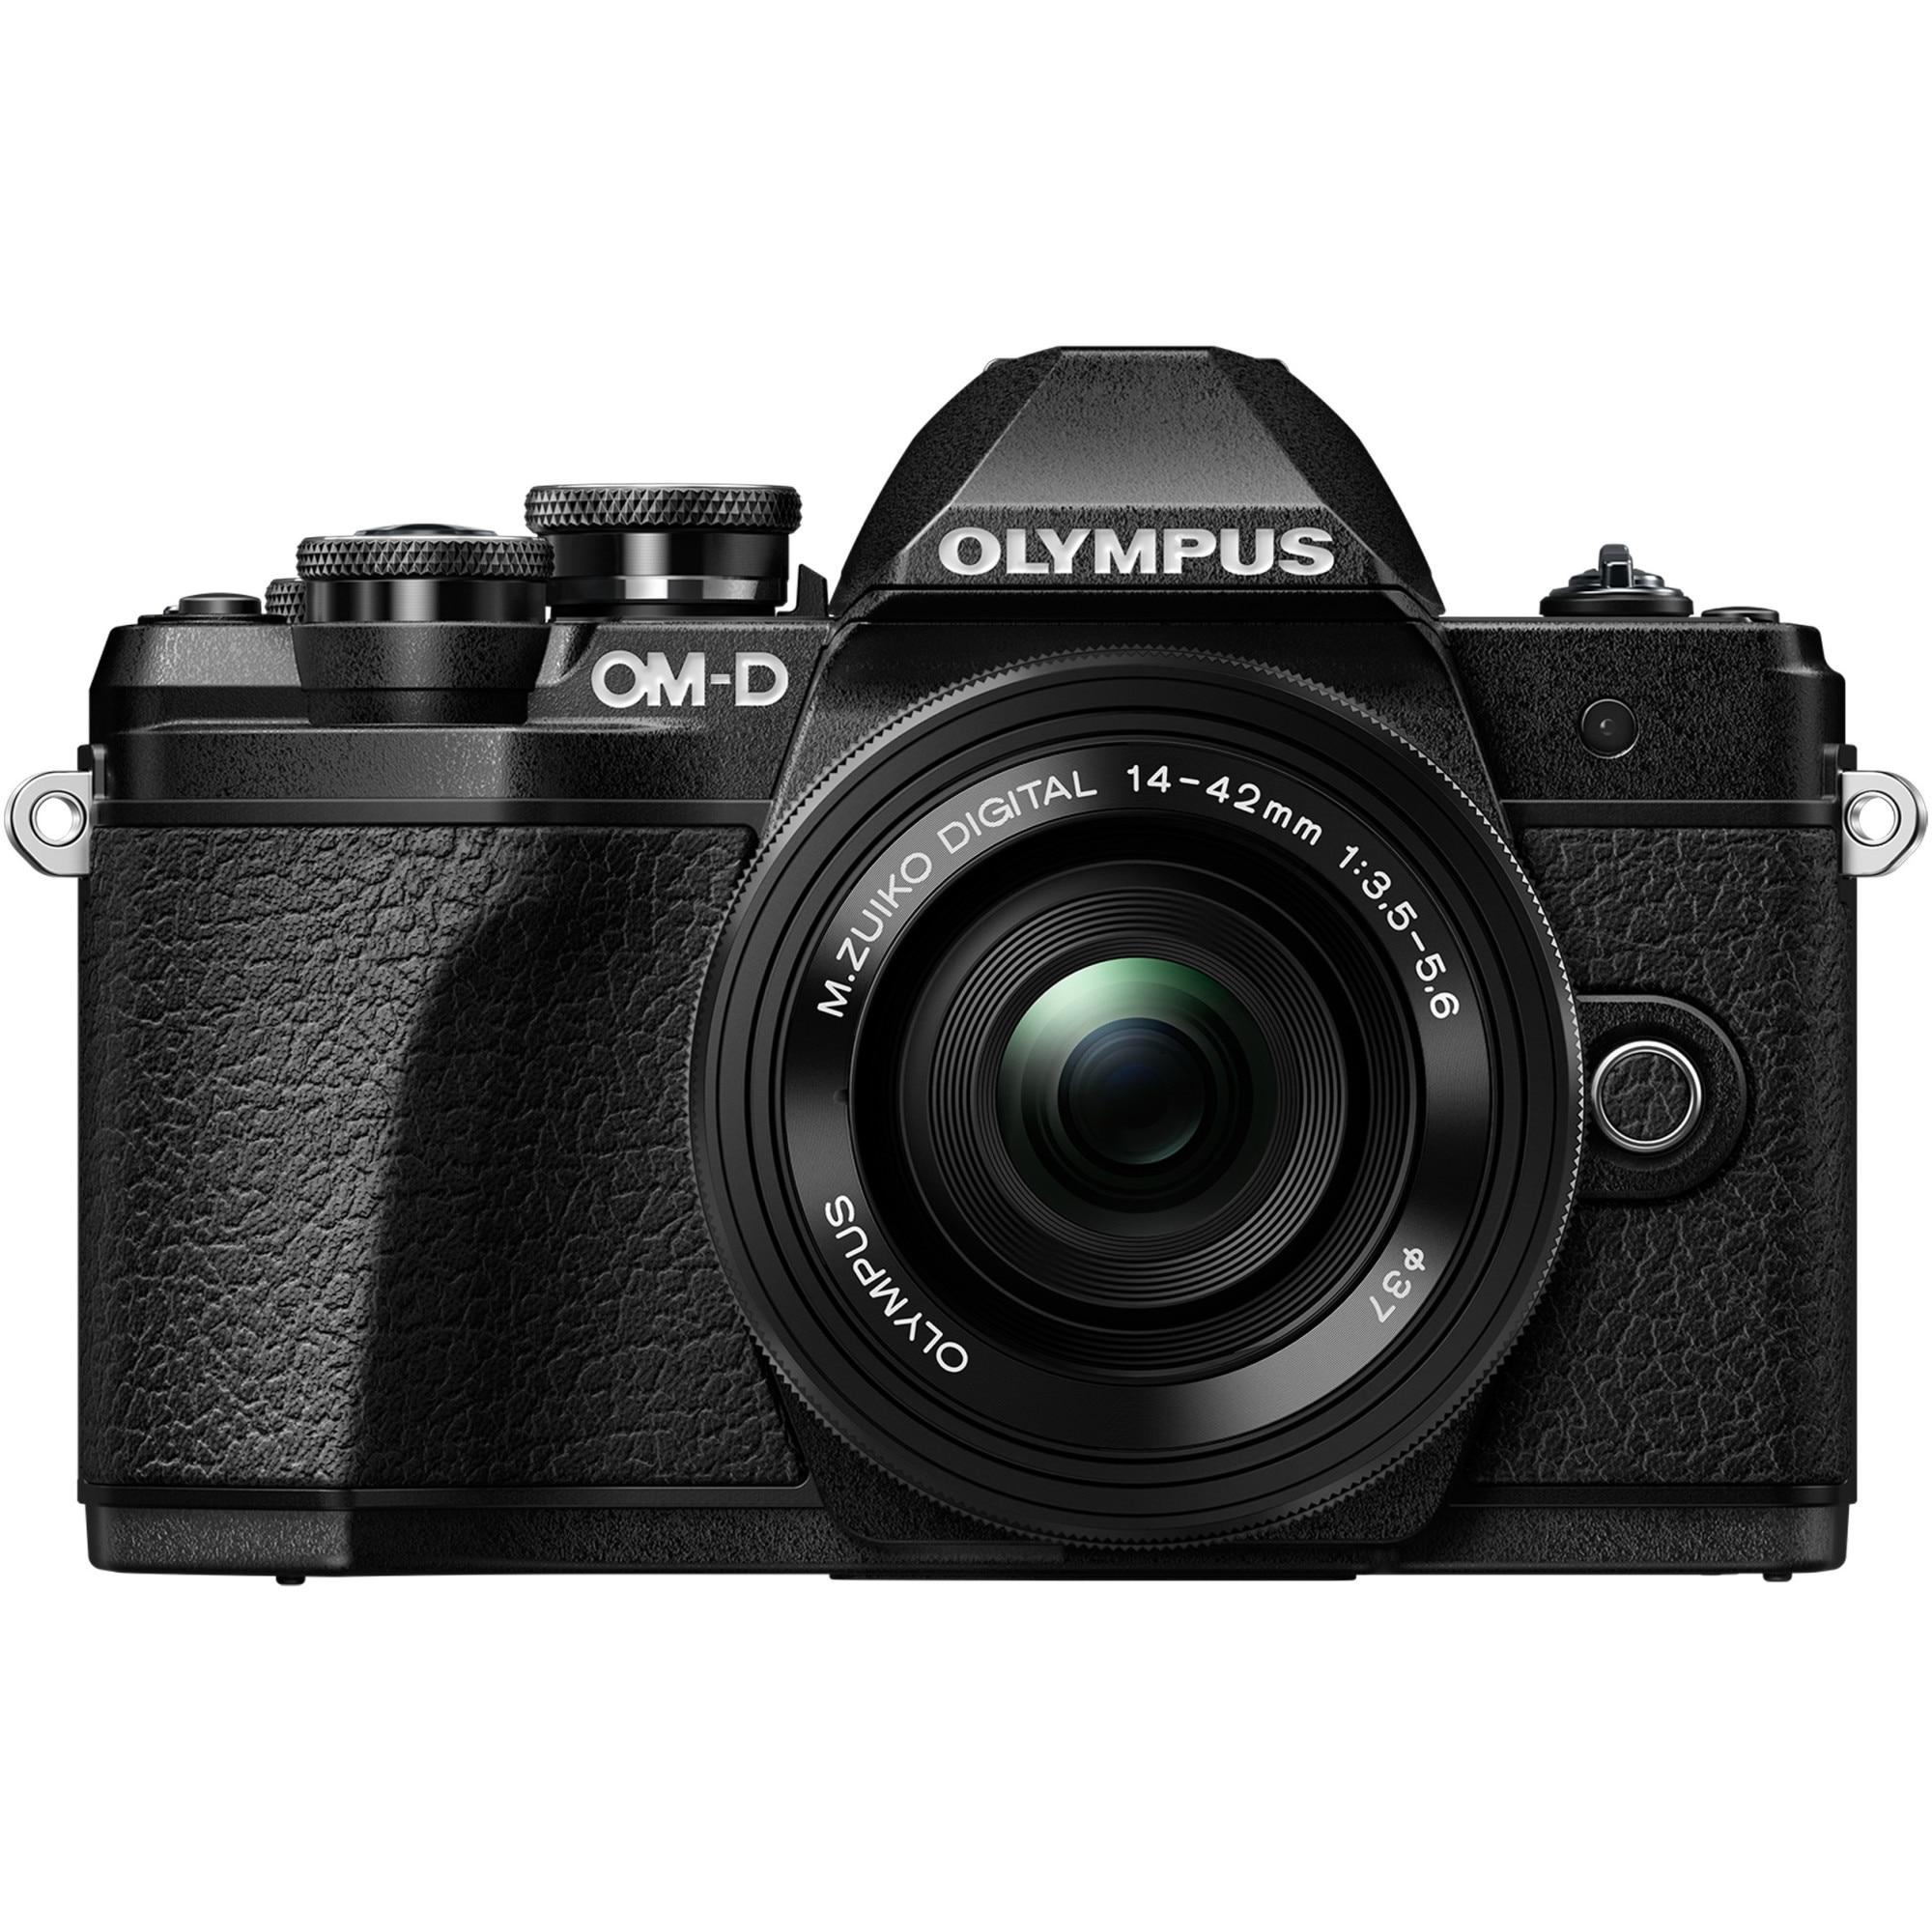 Fotografie Aparat foto Mirrorless Olympus E-M10 Mark III, 16MP, 4K, Negru + Obiectiv EZ-1442 Pancake, Negru